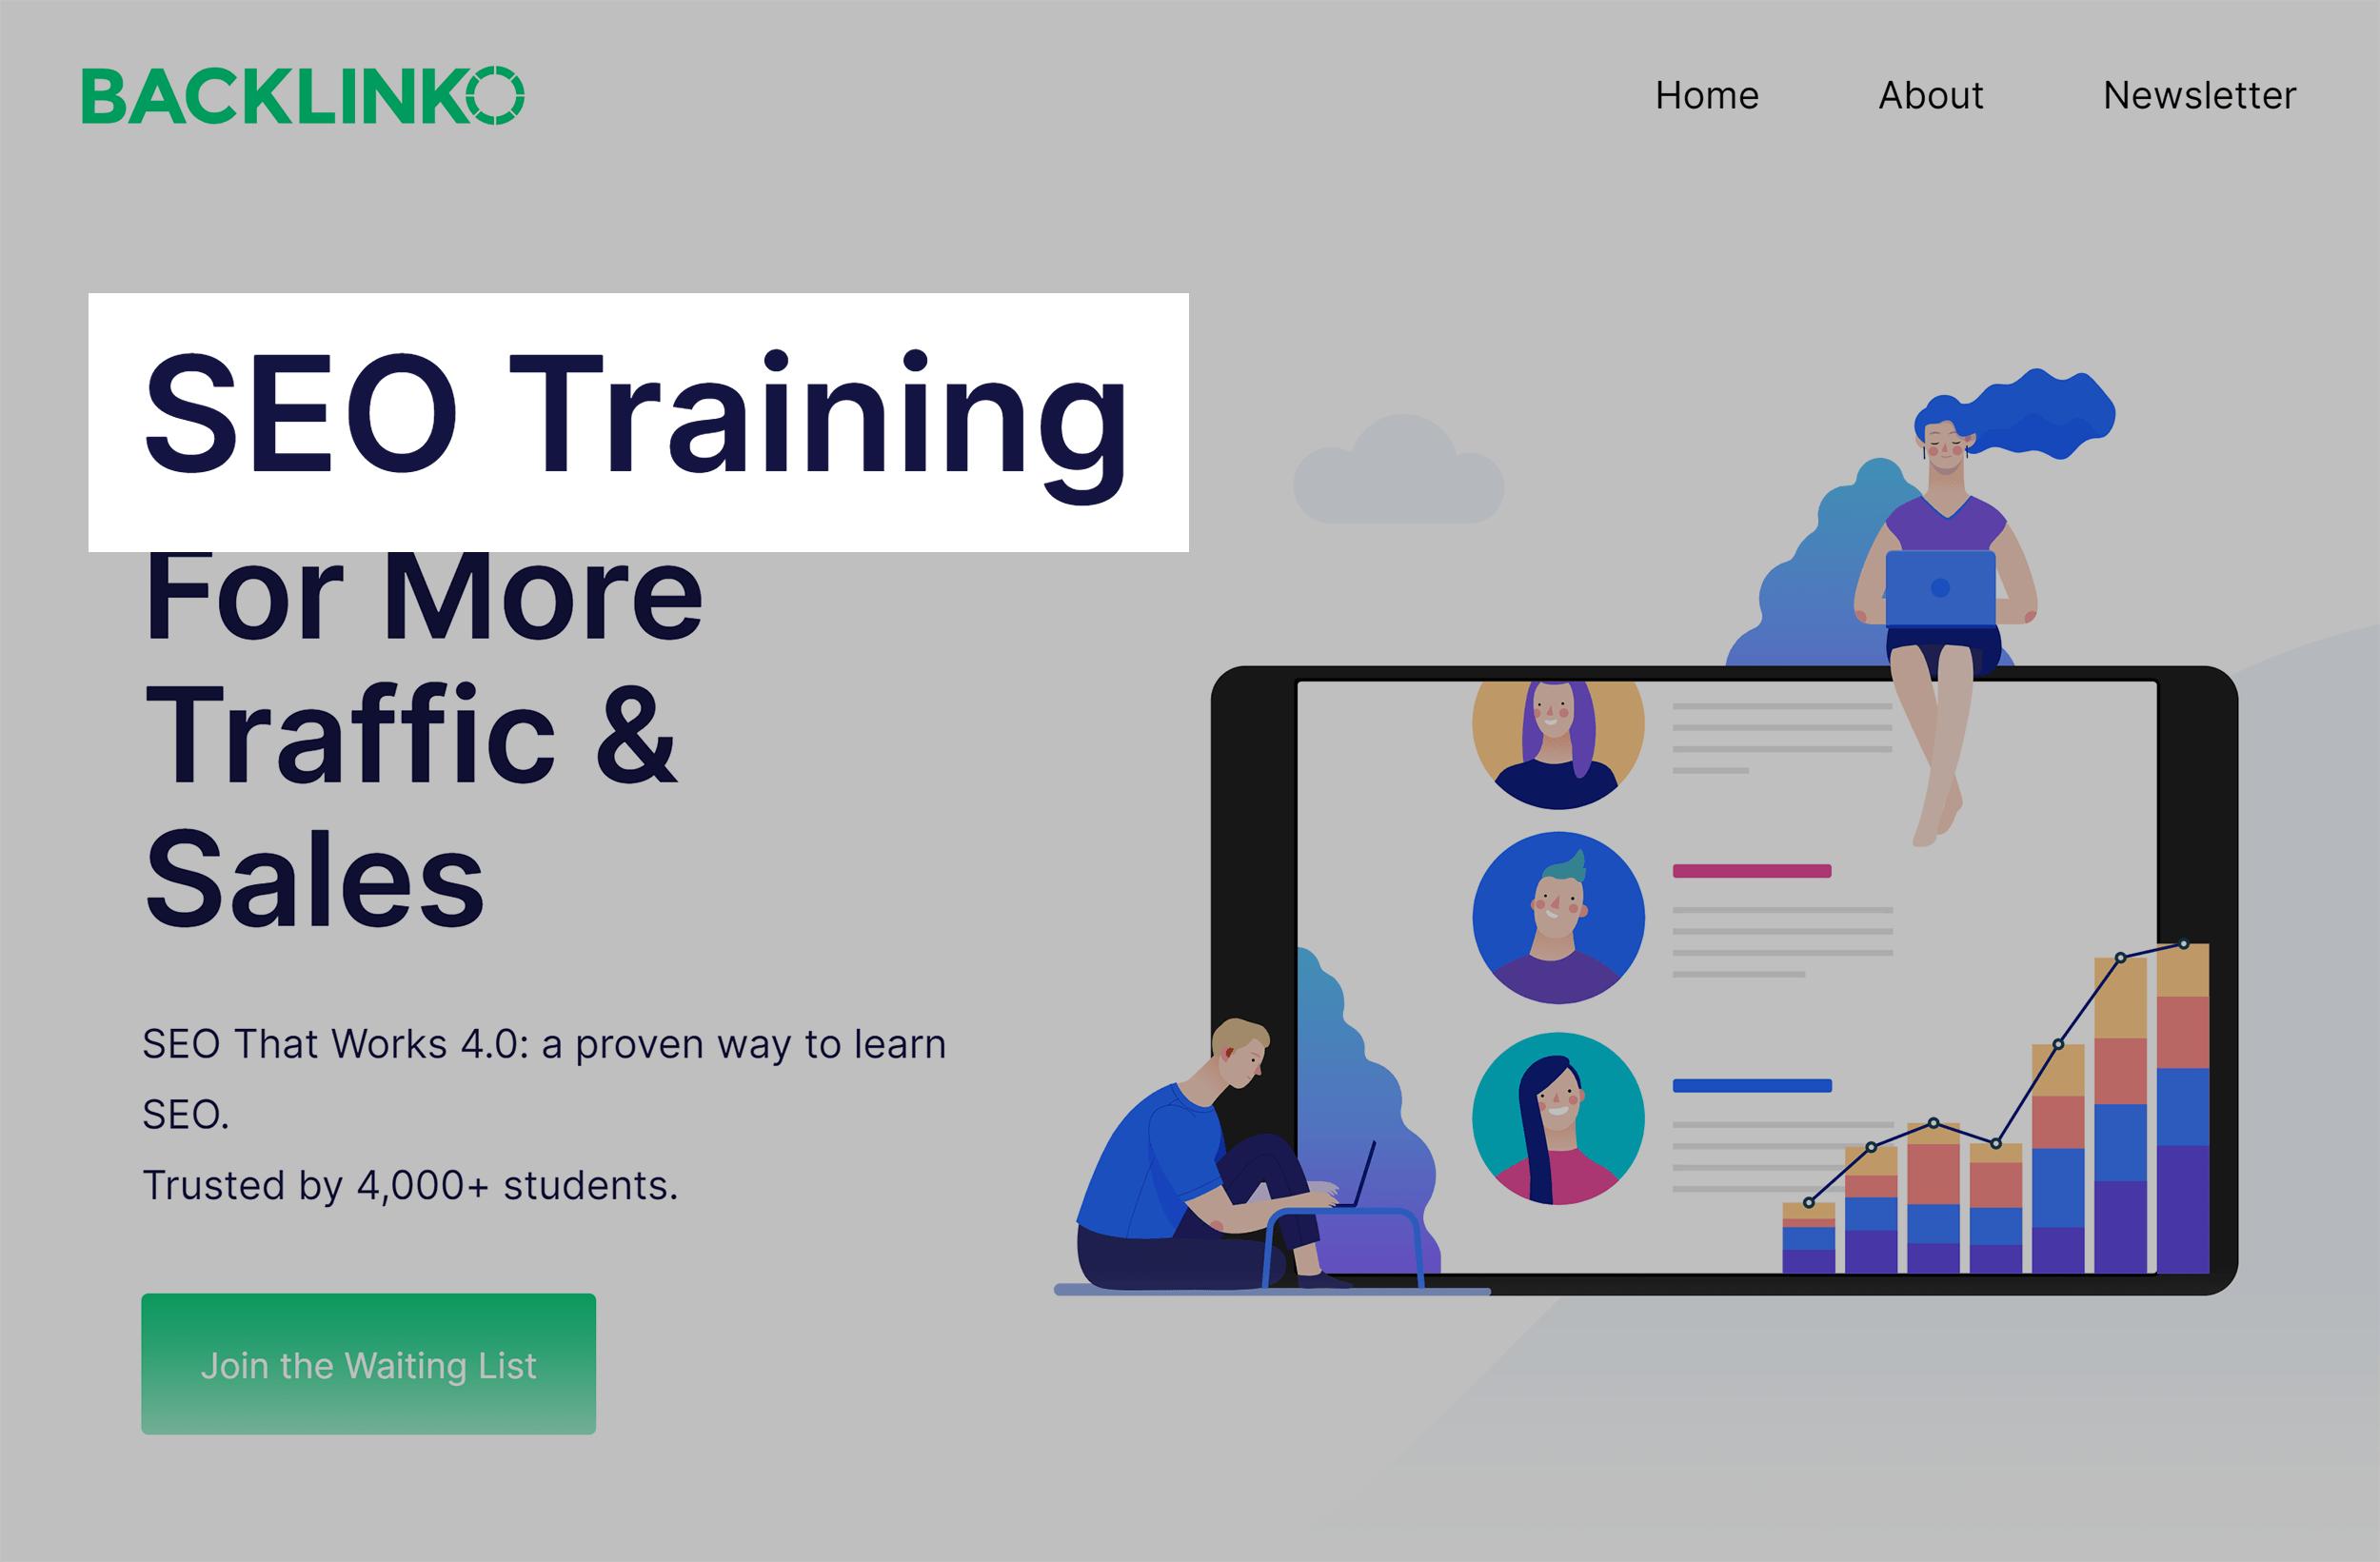 Backlinko – SEO training